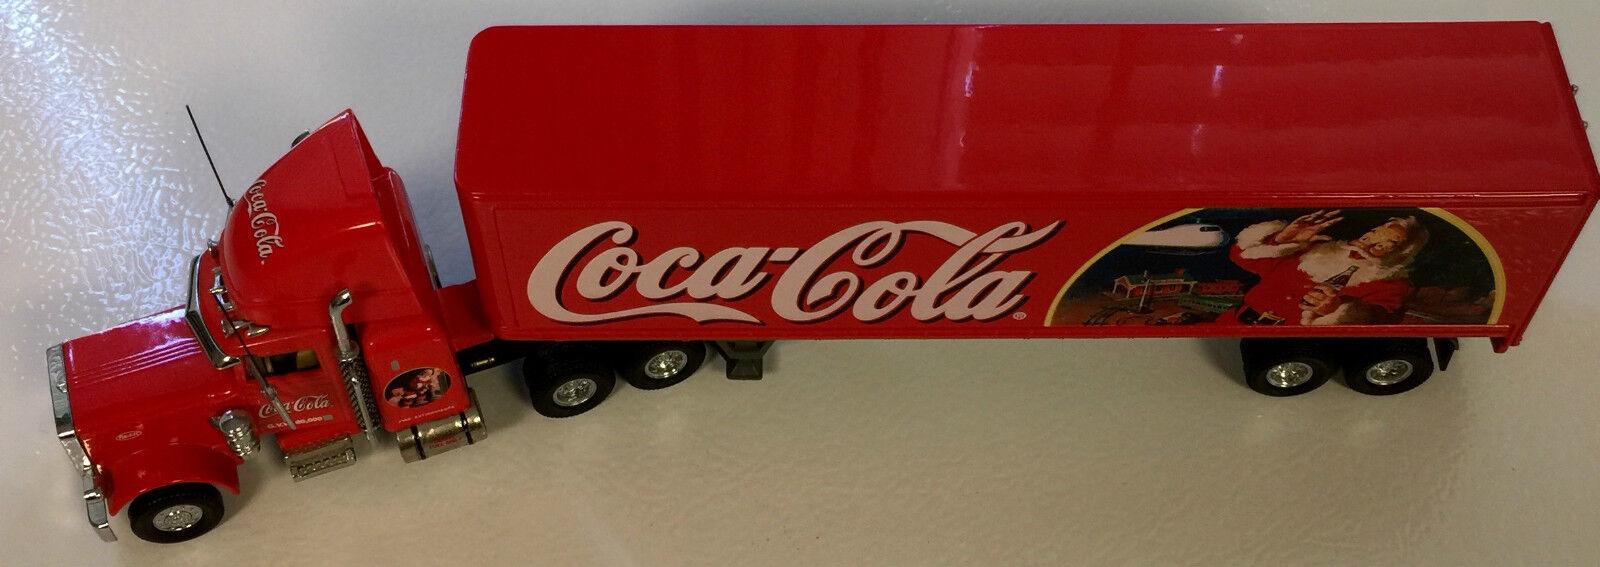 Matchbox coca - cola seasons greetings windschutzscheibe 359 lange transportfahrzeuge maßstab 1  58